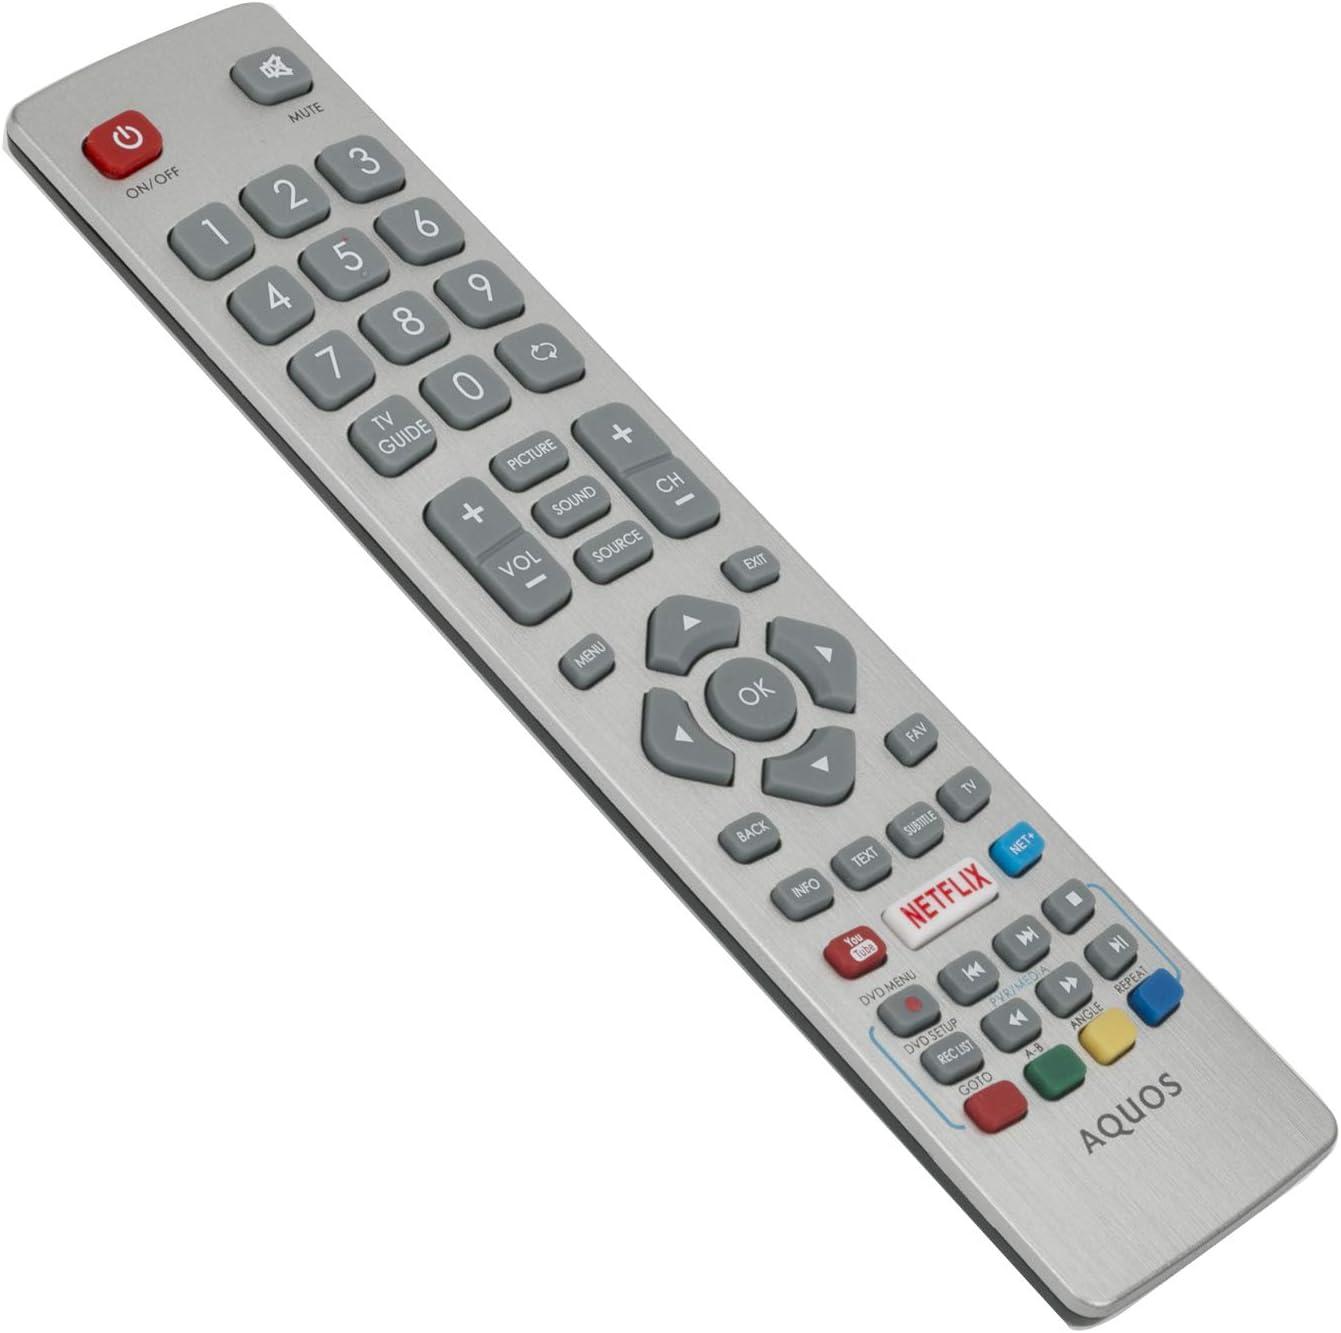 Vinabty Shwrmc0115 Aquos Fernbedienung Mit Netflix Elektronik